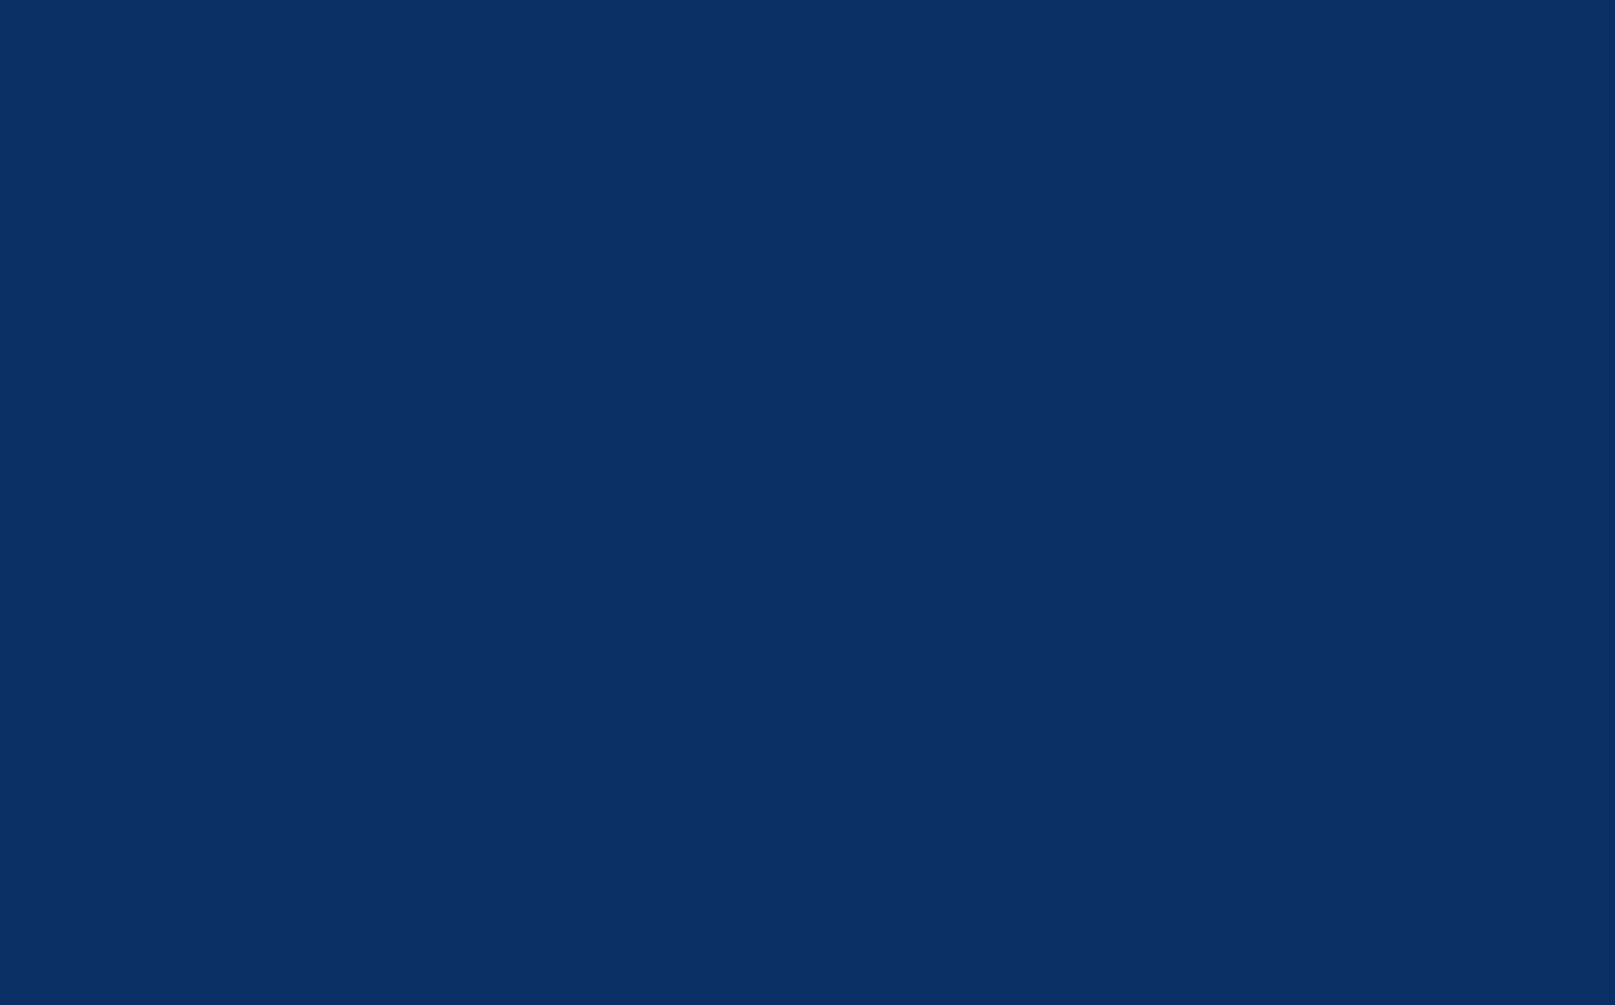 B1-TOFU-Report-Digital_Transformation-Tech-Companies BG 1